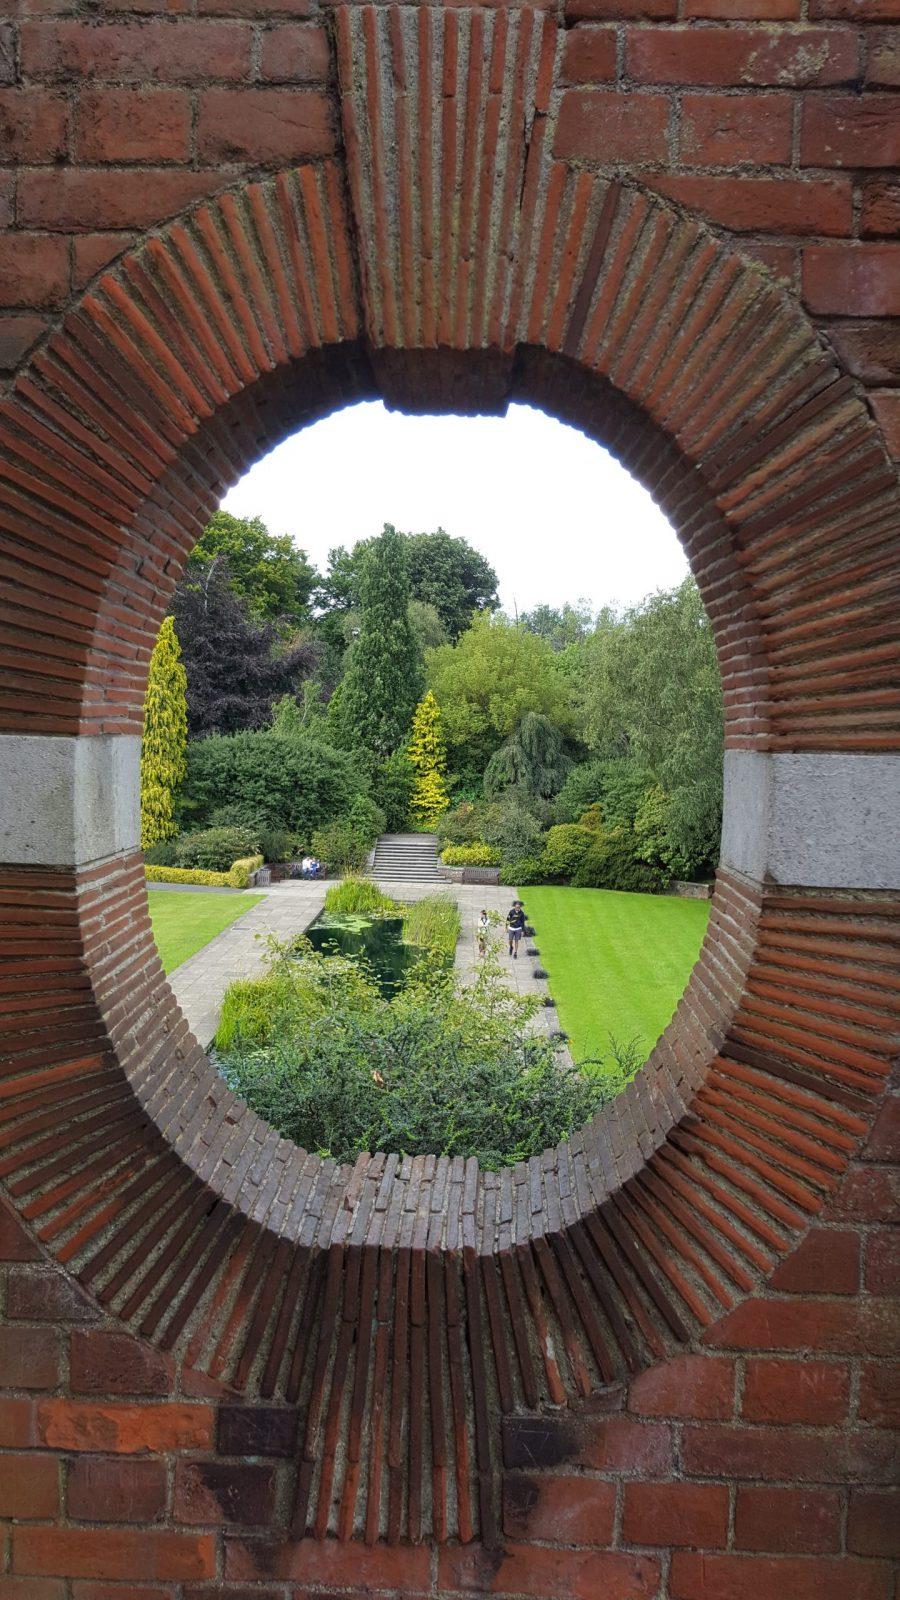 Visiting Hill Garden & Pergola, Hampstead Heath: Photo Gallery 19